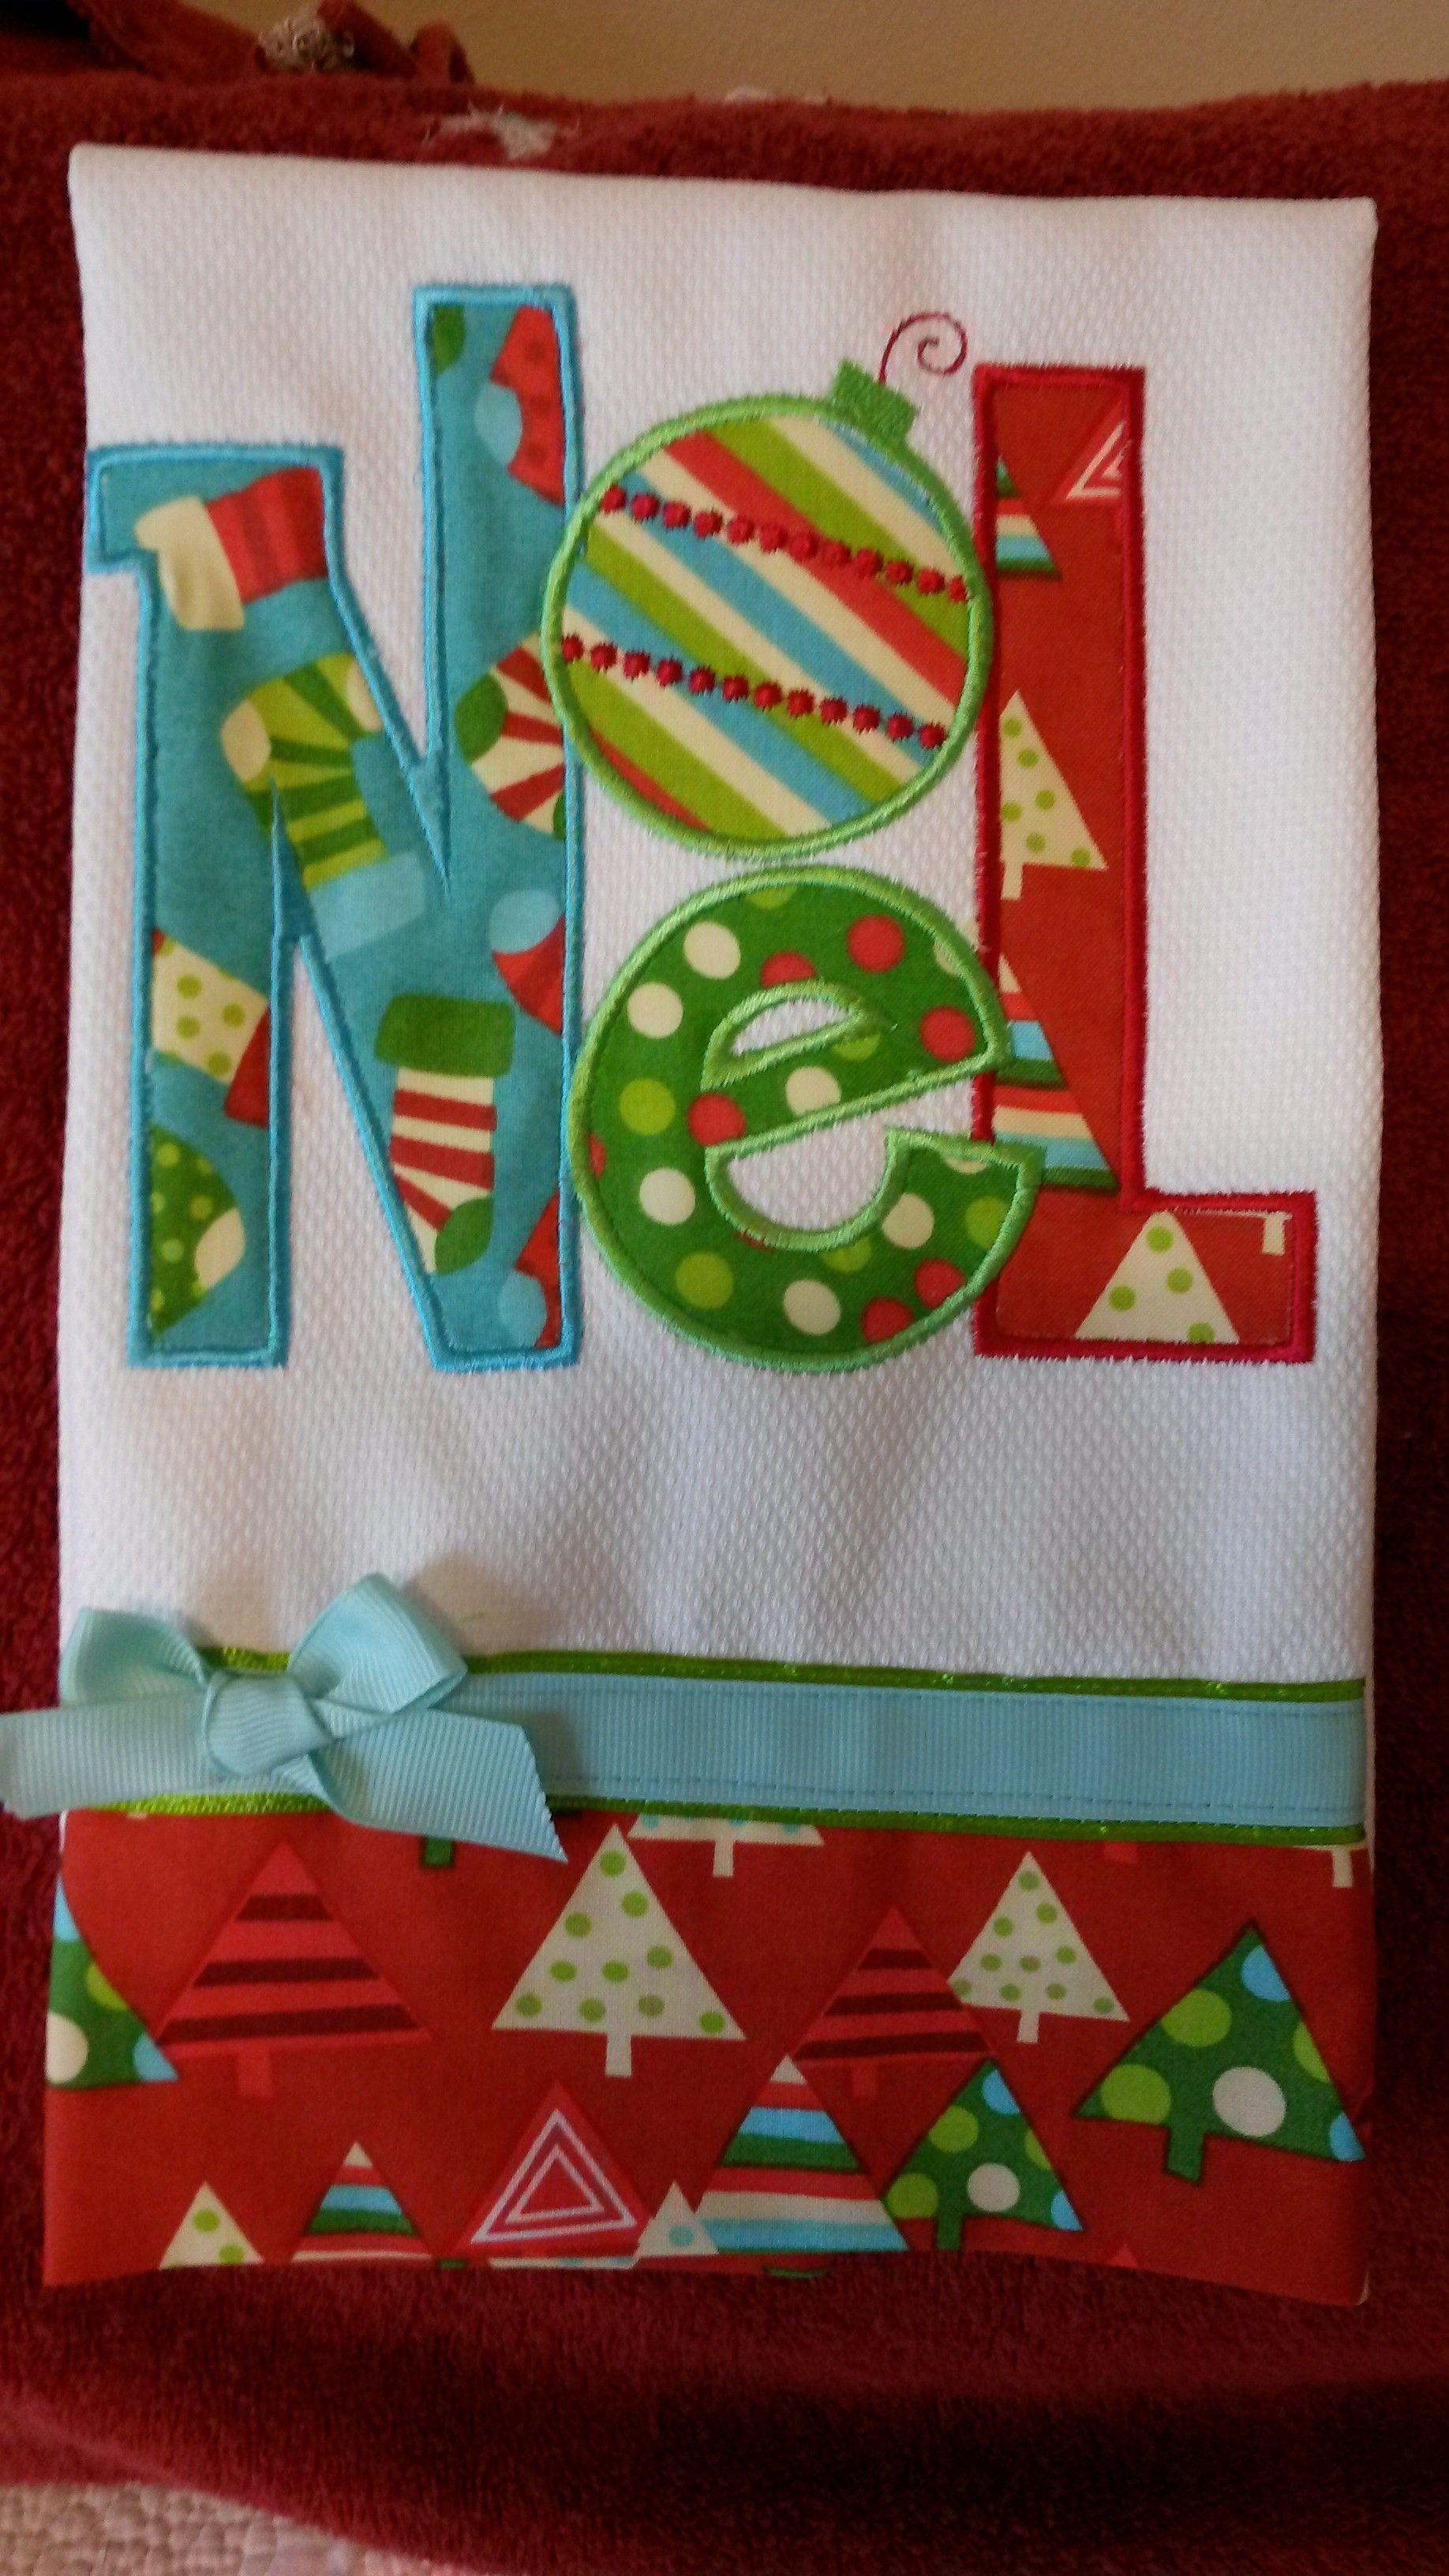 Christmas Tea Towels | Kitchen towels | Pinterest | Christmas tea ...